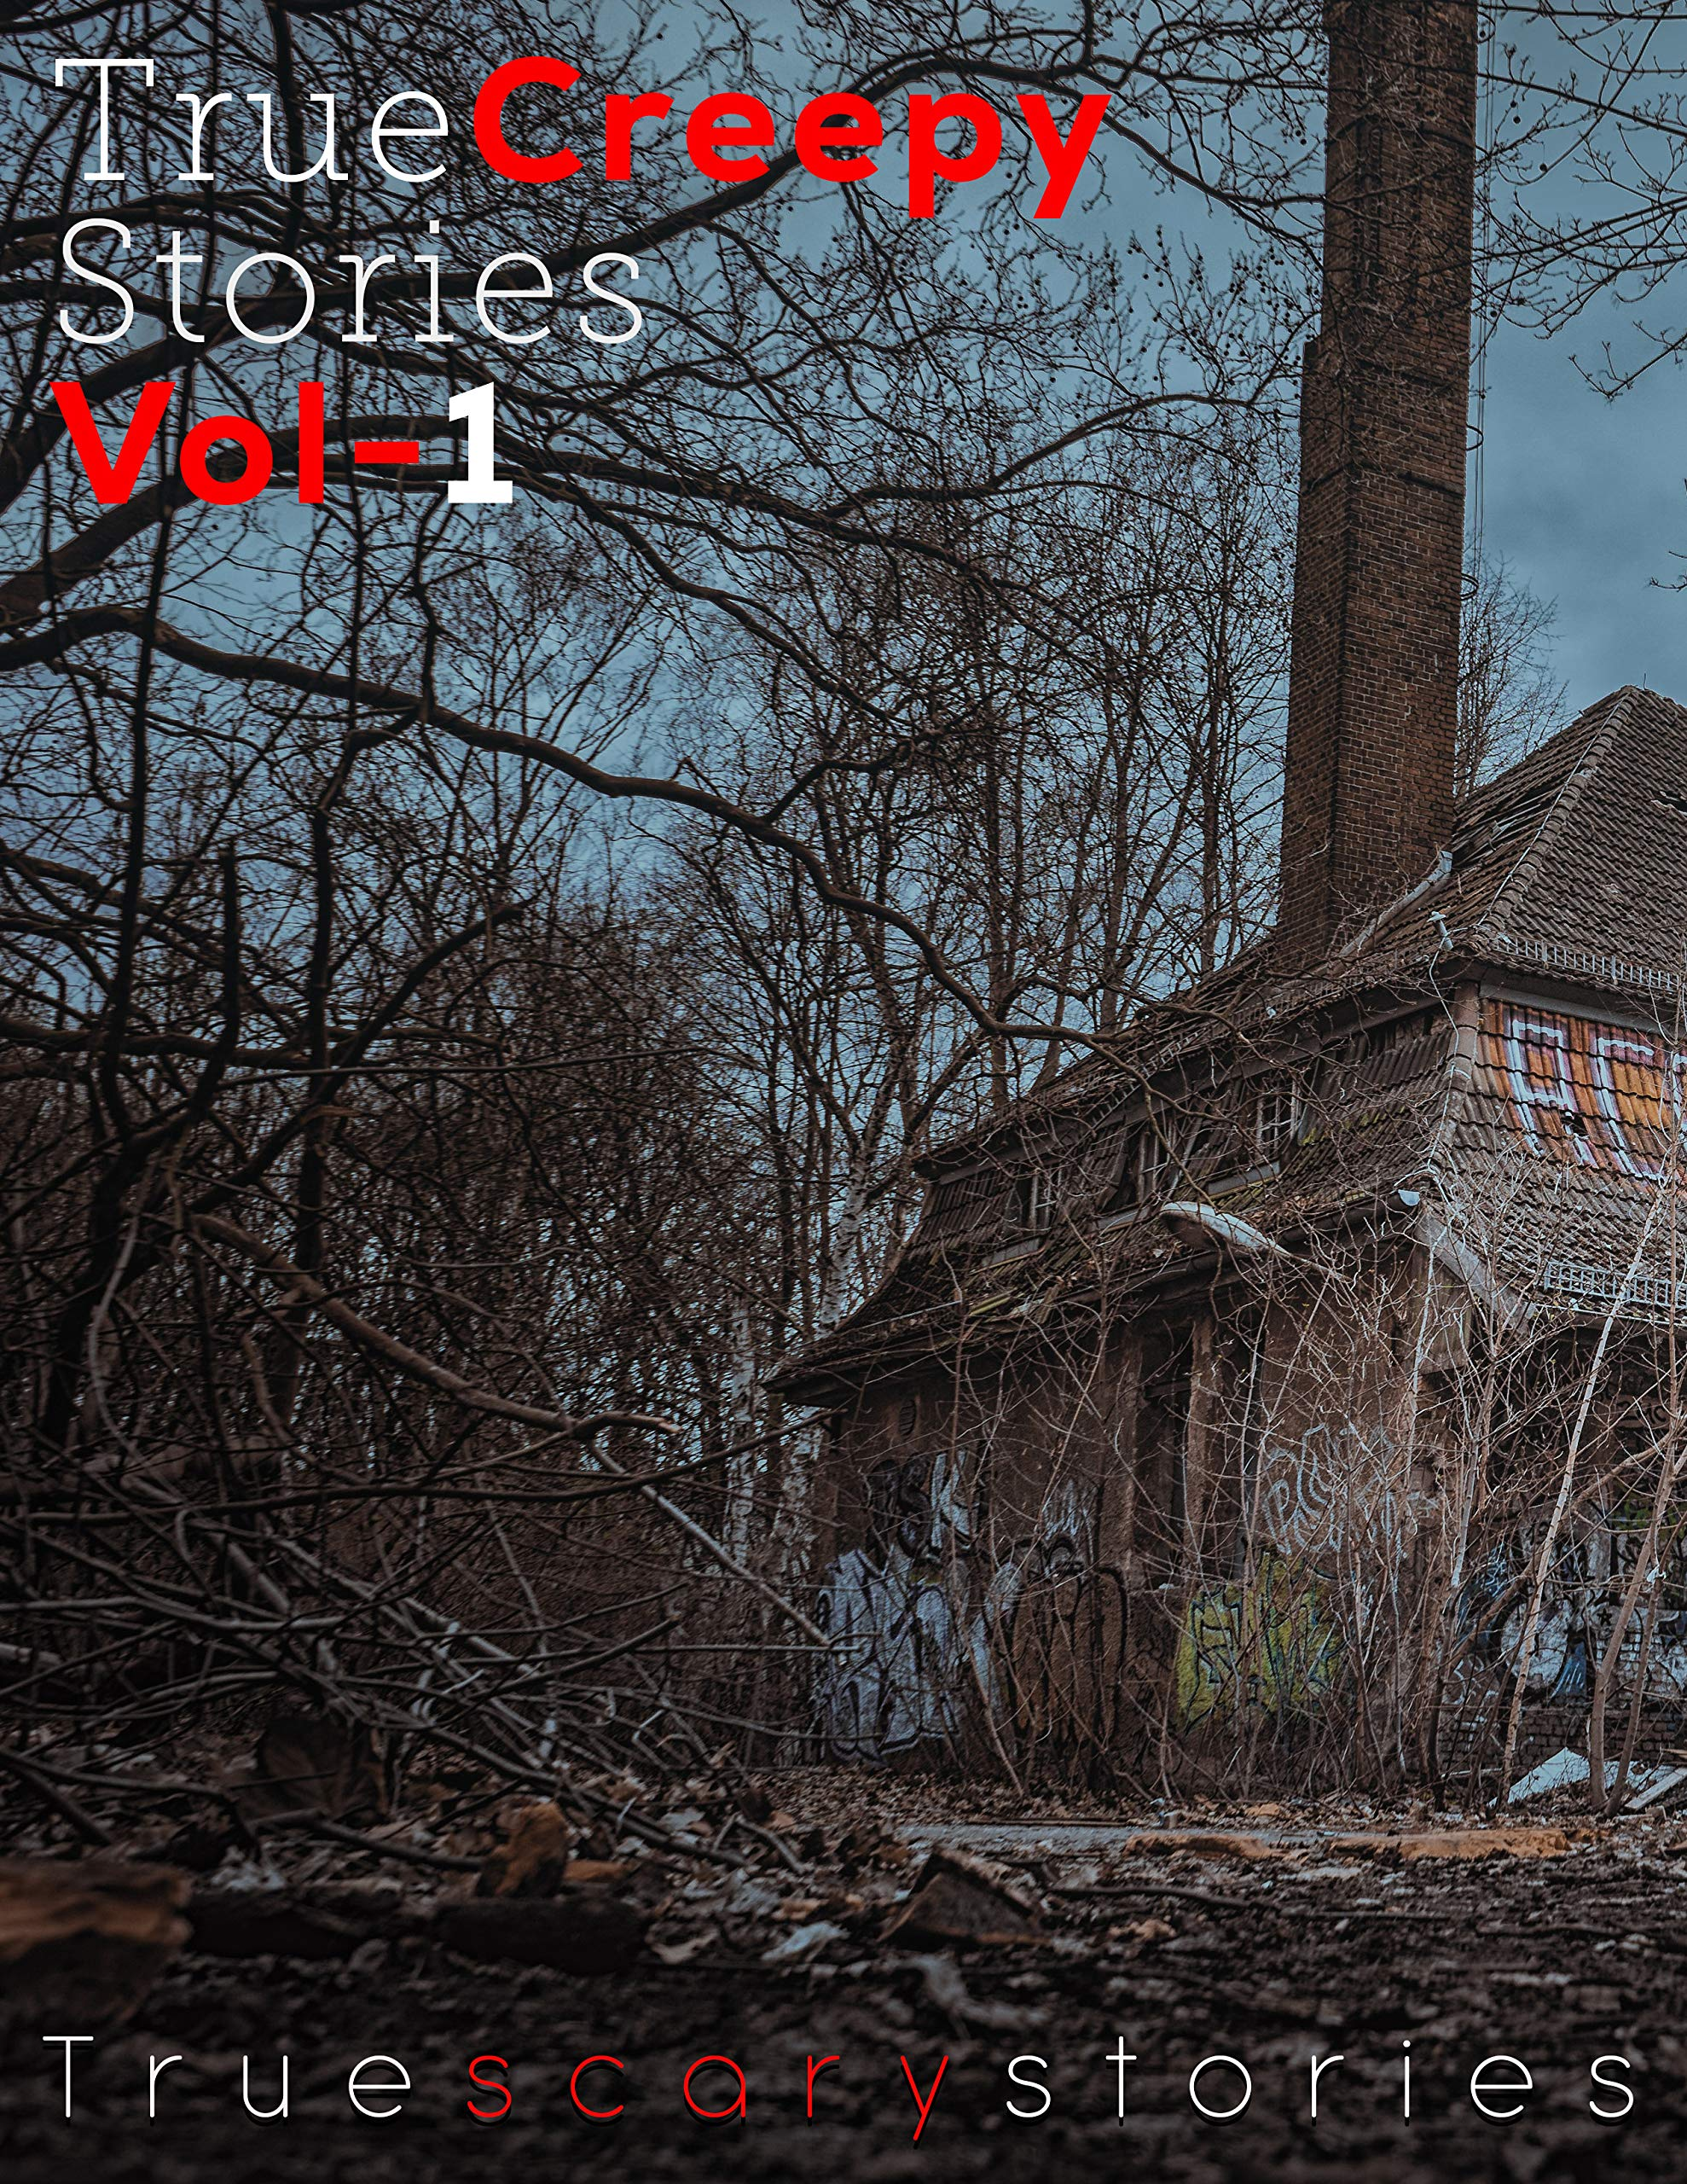 True Creepy Stories Vol-1: best True Horror Stories List